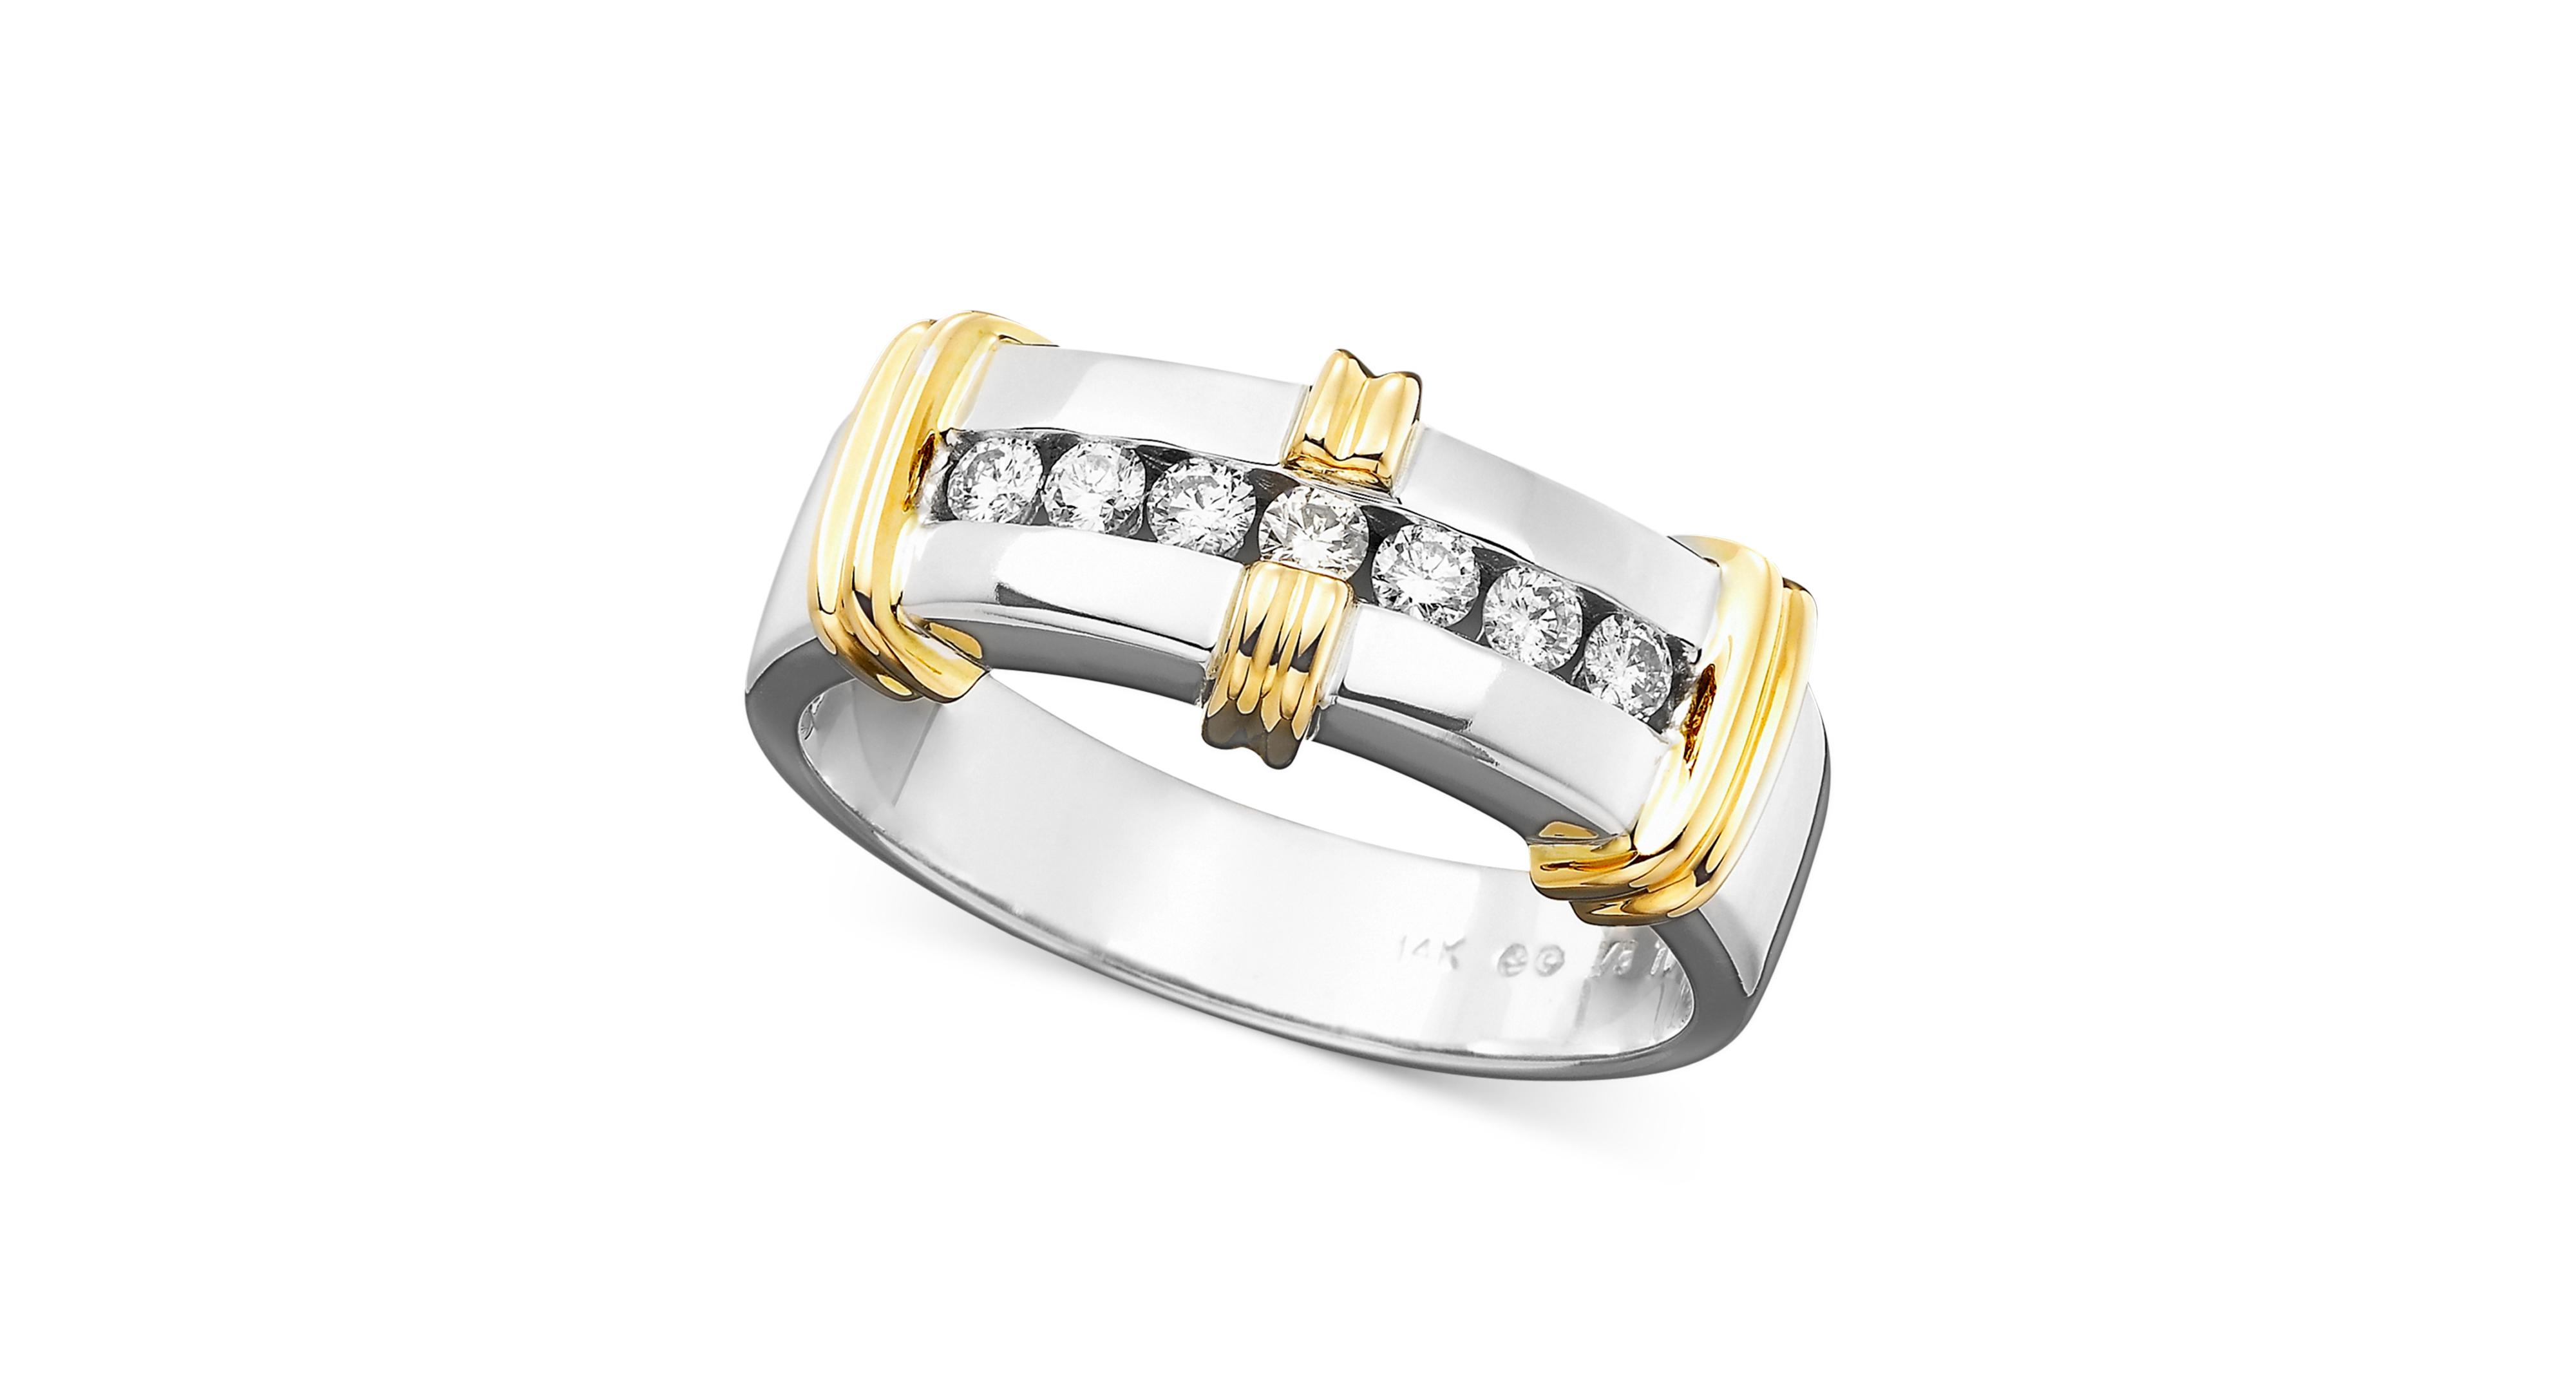 Men's Diamond Ring in 14k Gold (1/3 ct. tw.)